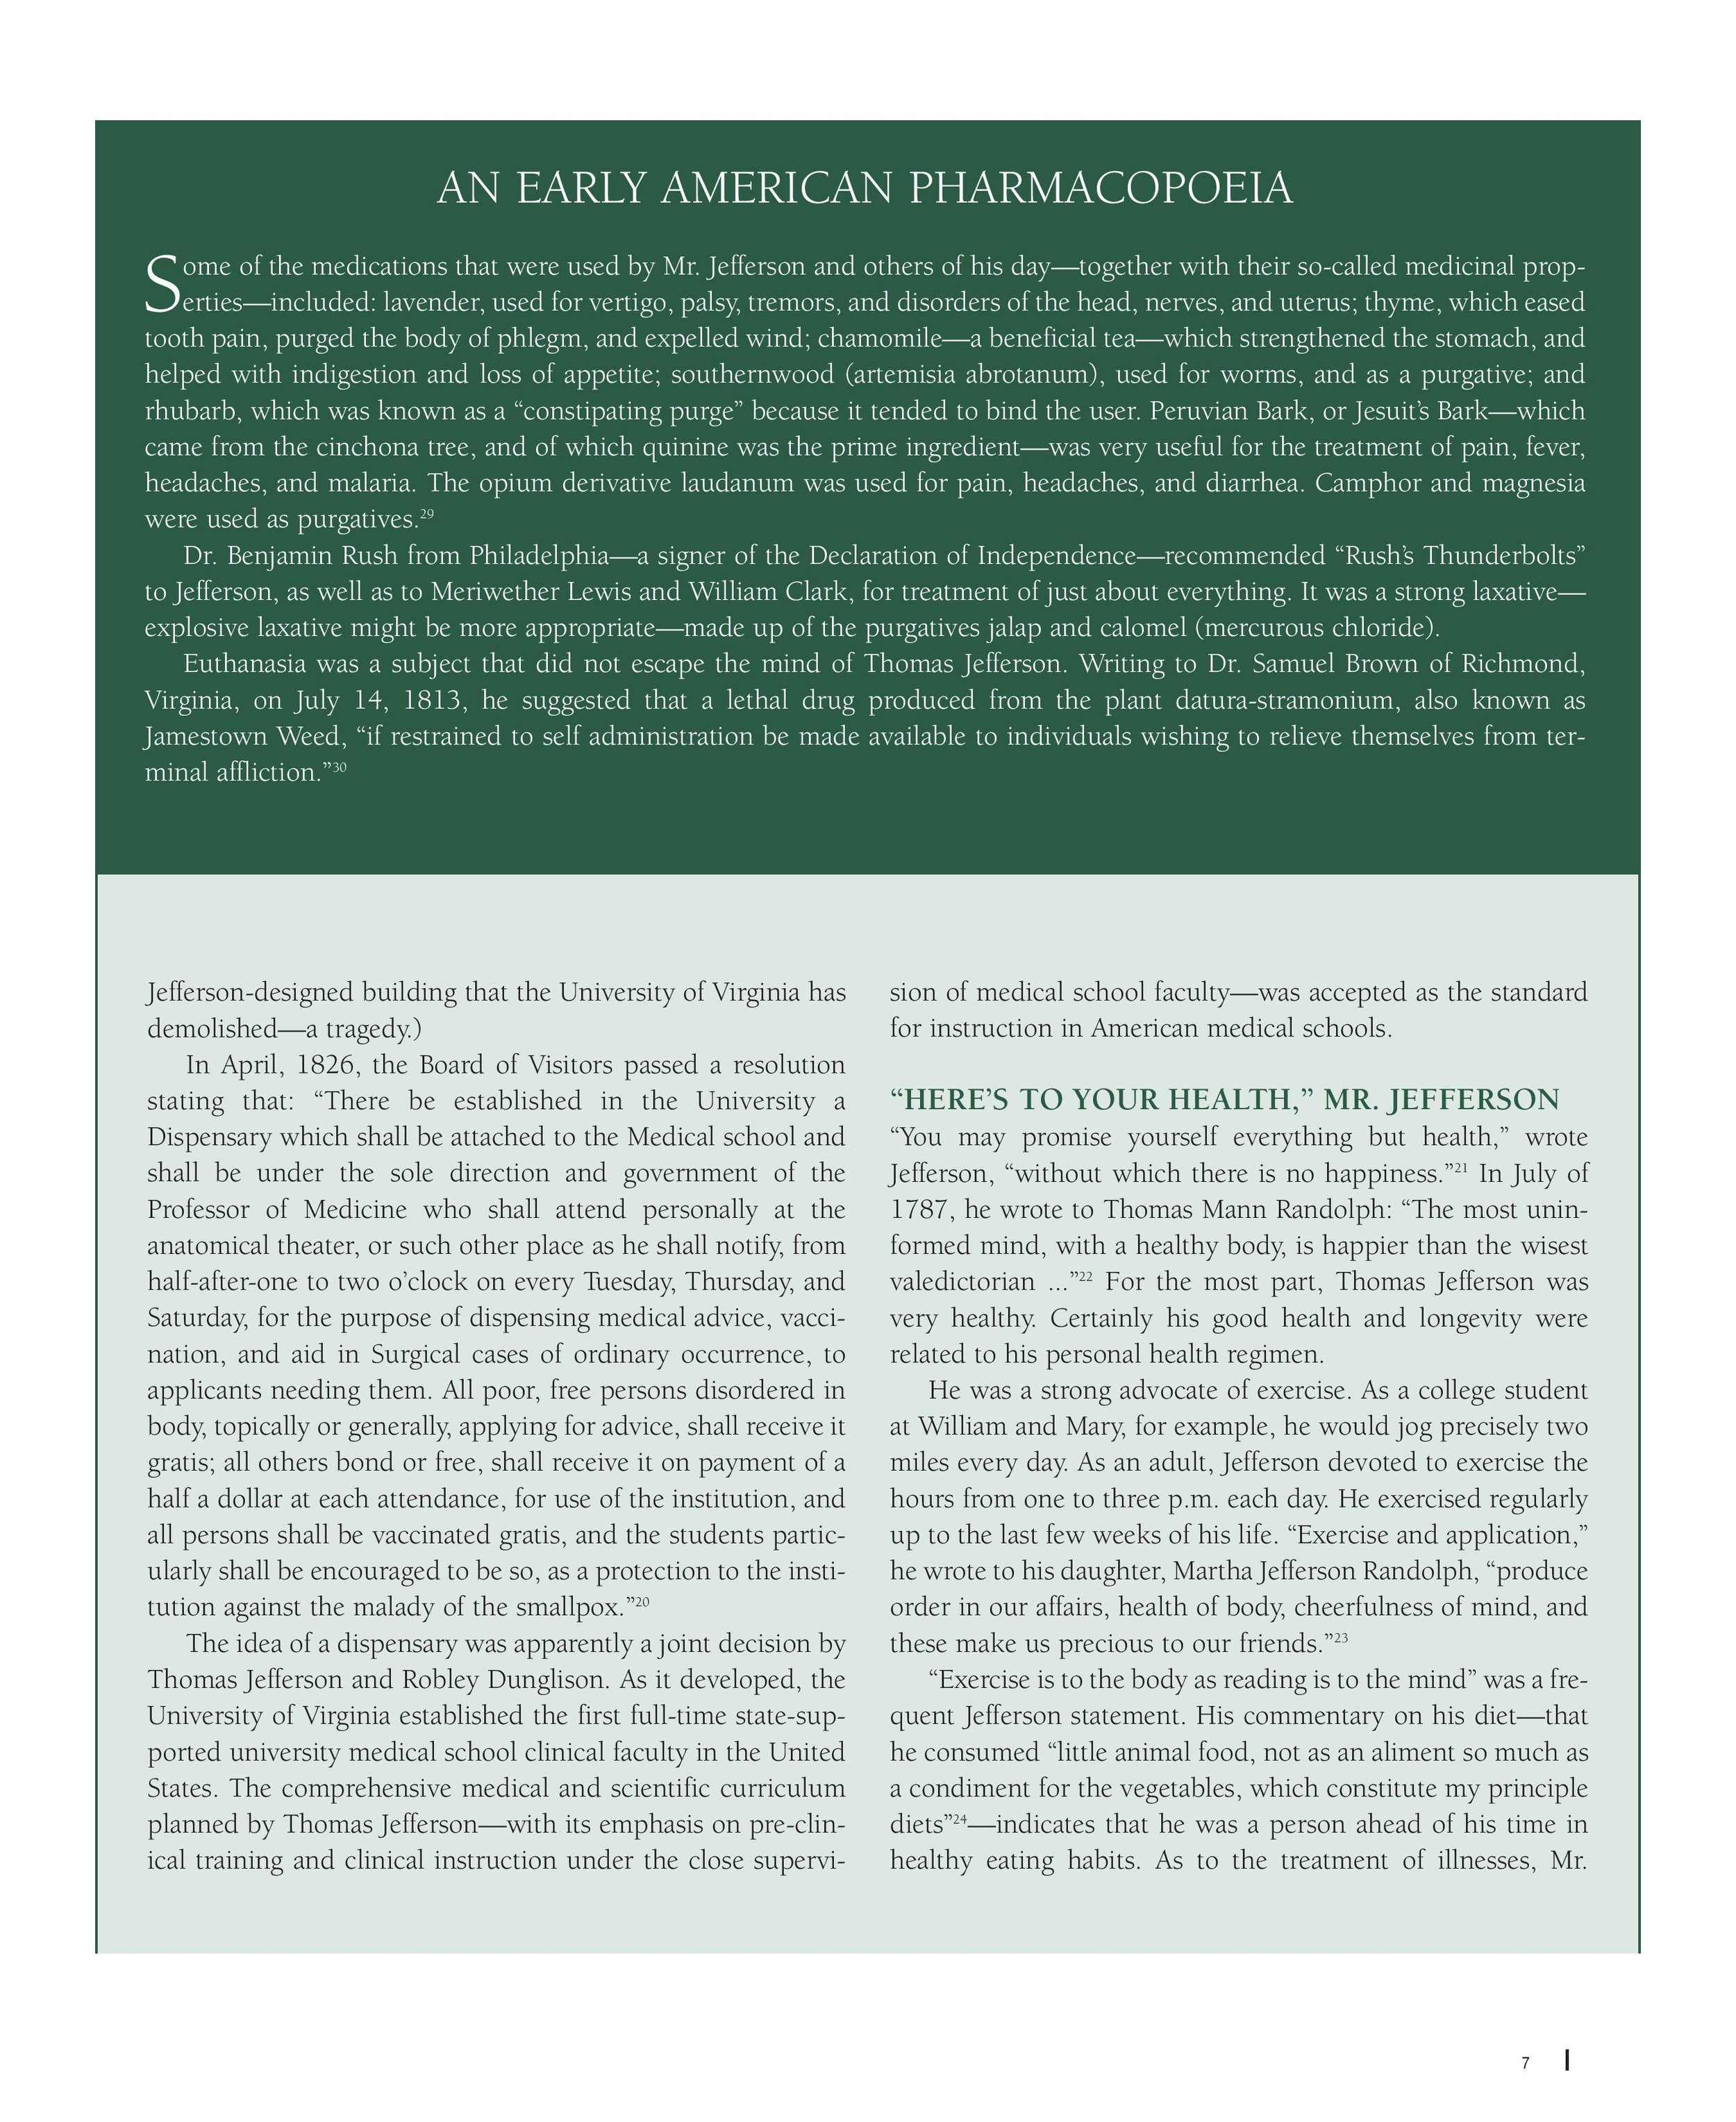 Jefferson_and_medicine-page-005.jpg